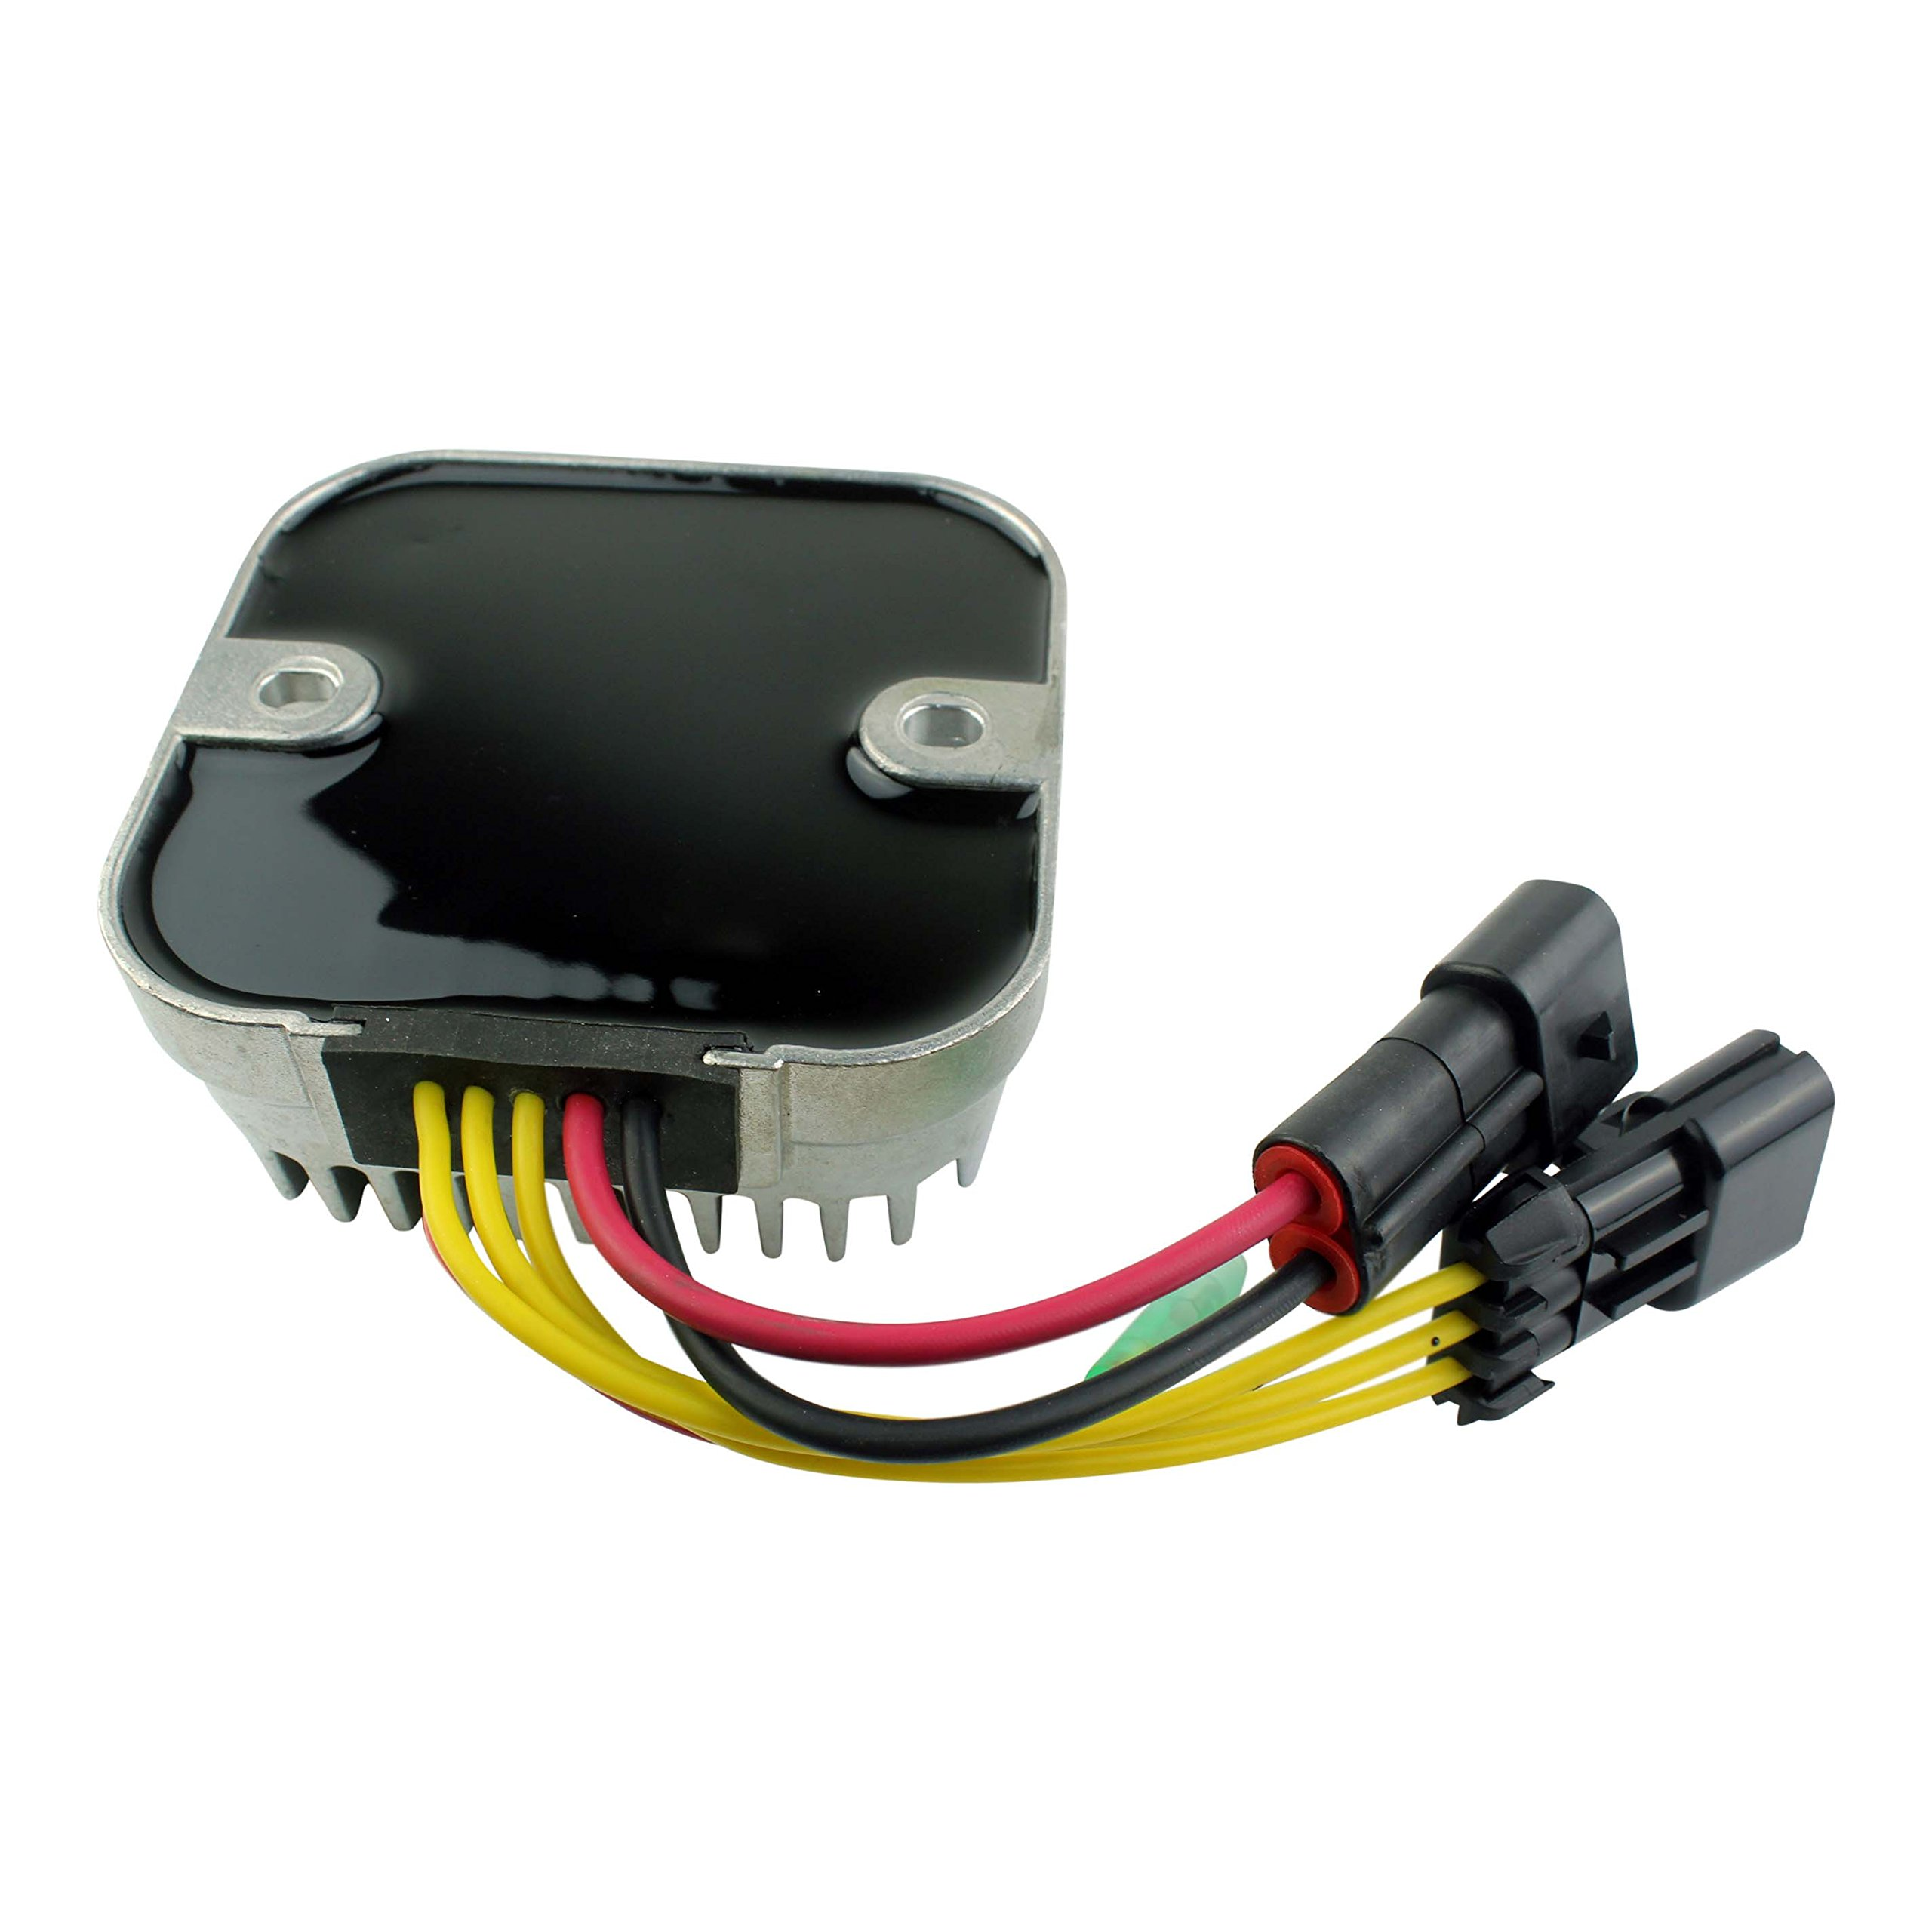 Mosfet Voltage Regulator Rectifier For Polaris RZR 800 Sportsman 800/500 Ranger 500/800 2010 2011 2012 2013 2014 OEM Repl.# 4012748 by RMSTATOR (Image #1)